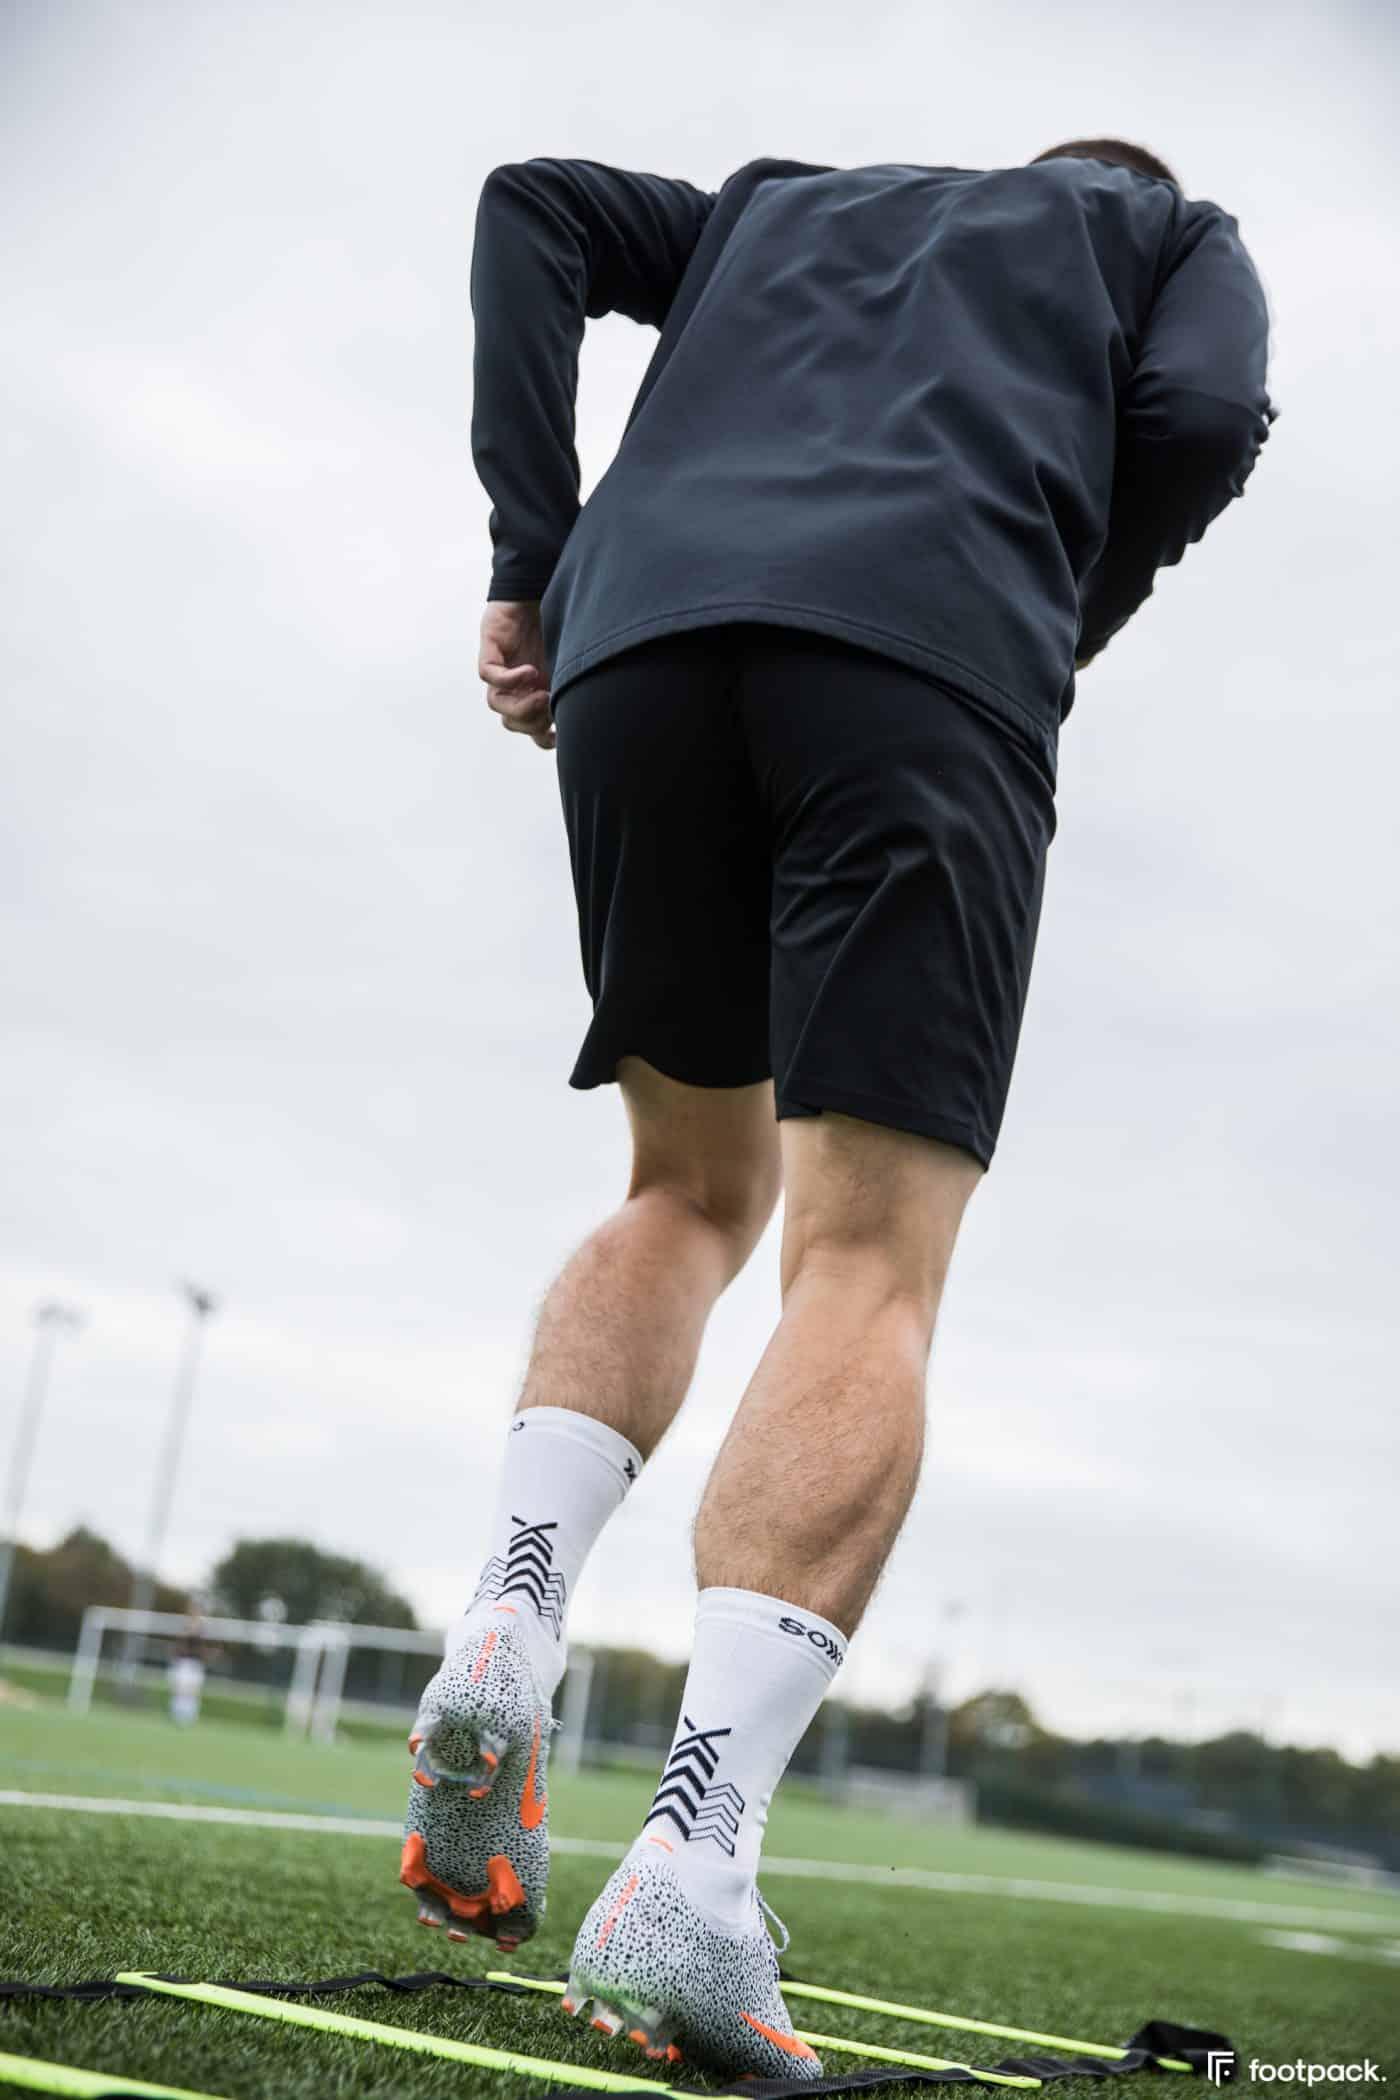 test-chaussettes-sox-pro-ultra-light-footpack-16